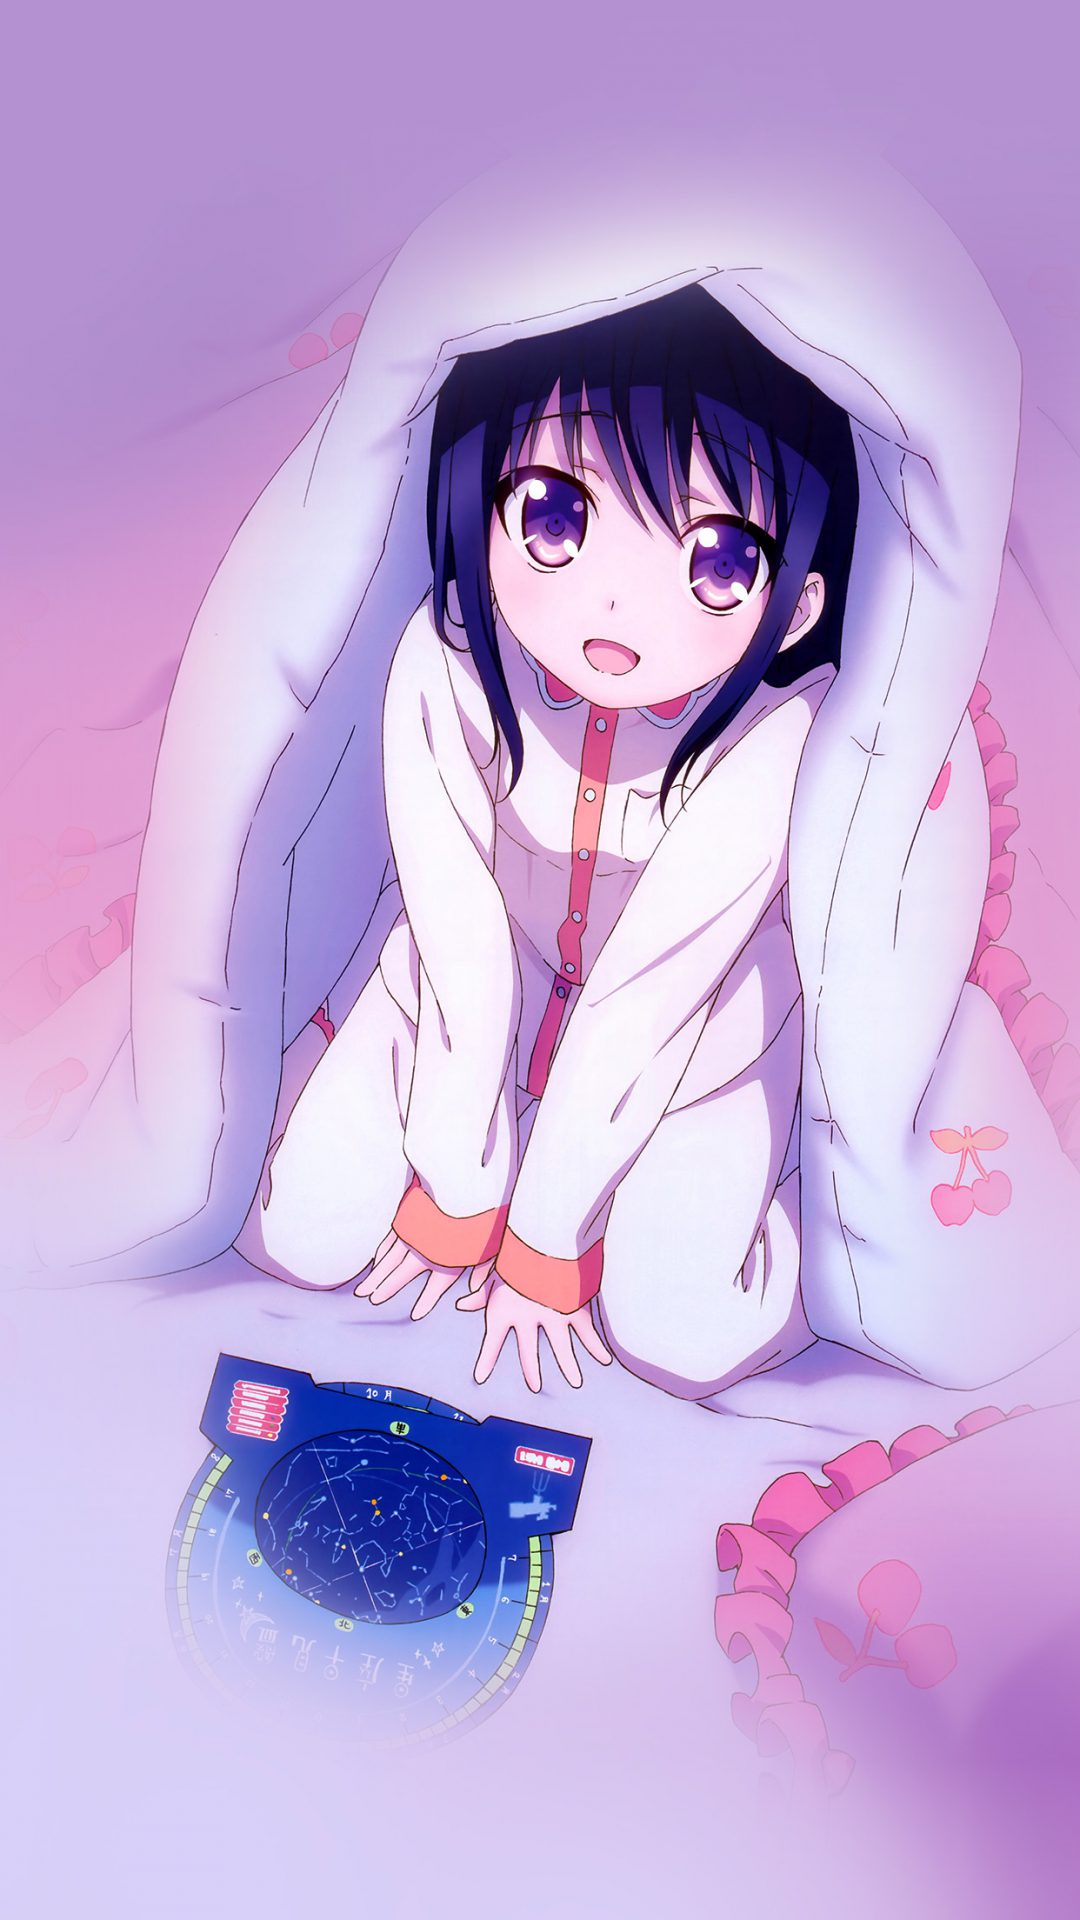 Charlotte Anime Nyantype Cute Girl